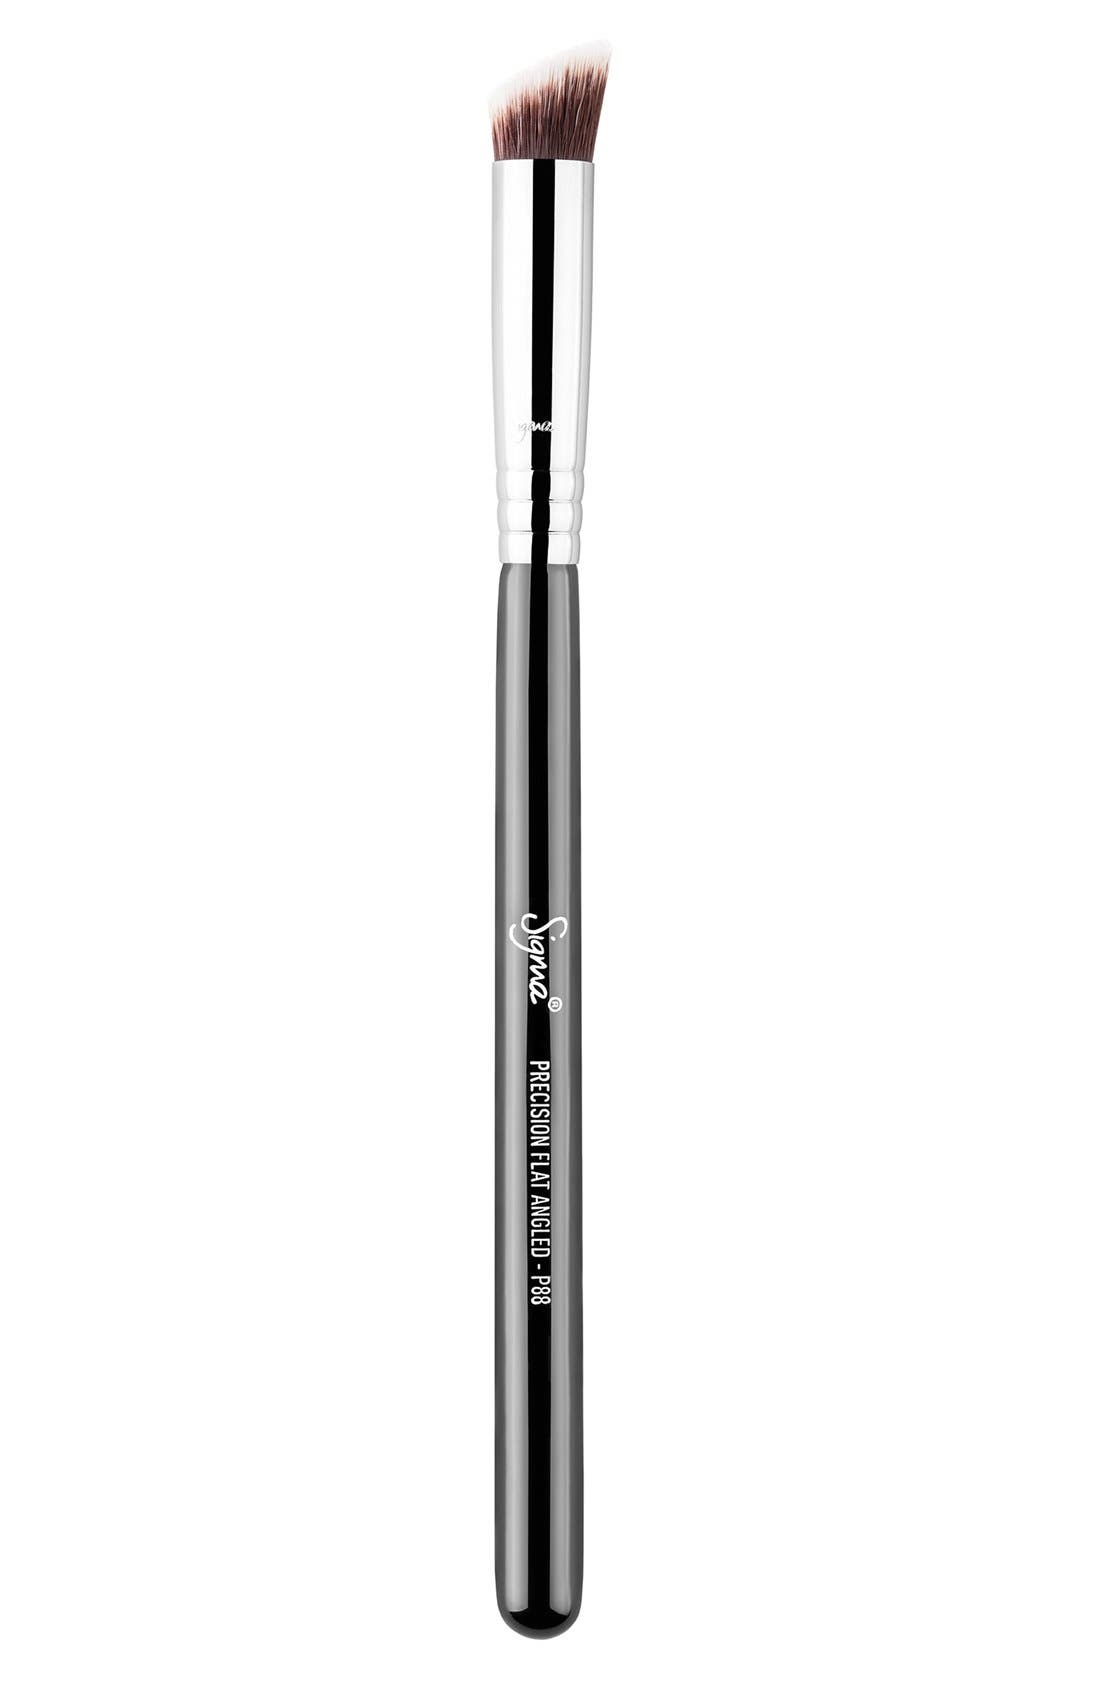 P88 Precision Flat Angled<sup>™</sup> Brush,                         Main,                         color, NO COLOR